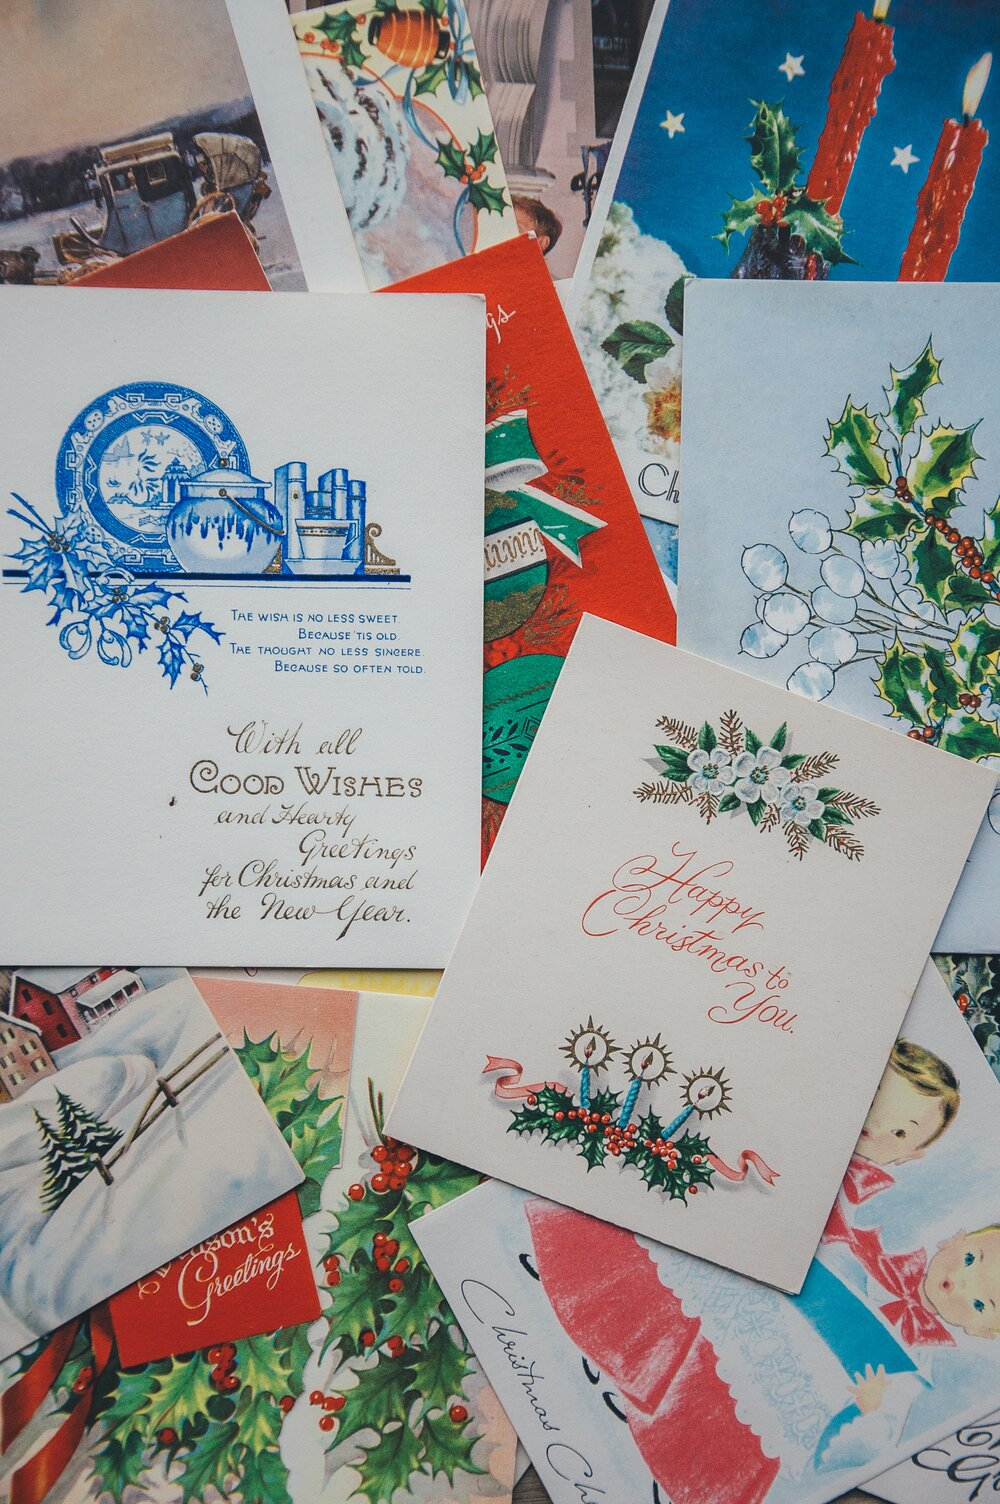 The UK Christmas Card market uses 33 million trees each year.